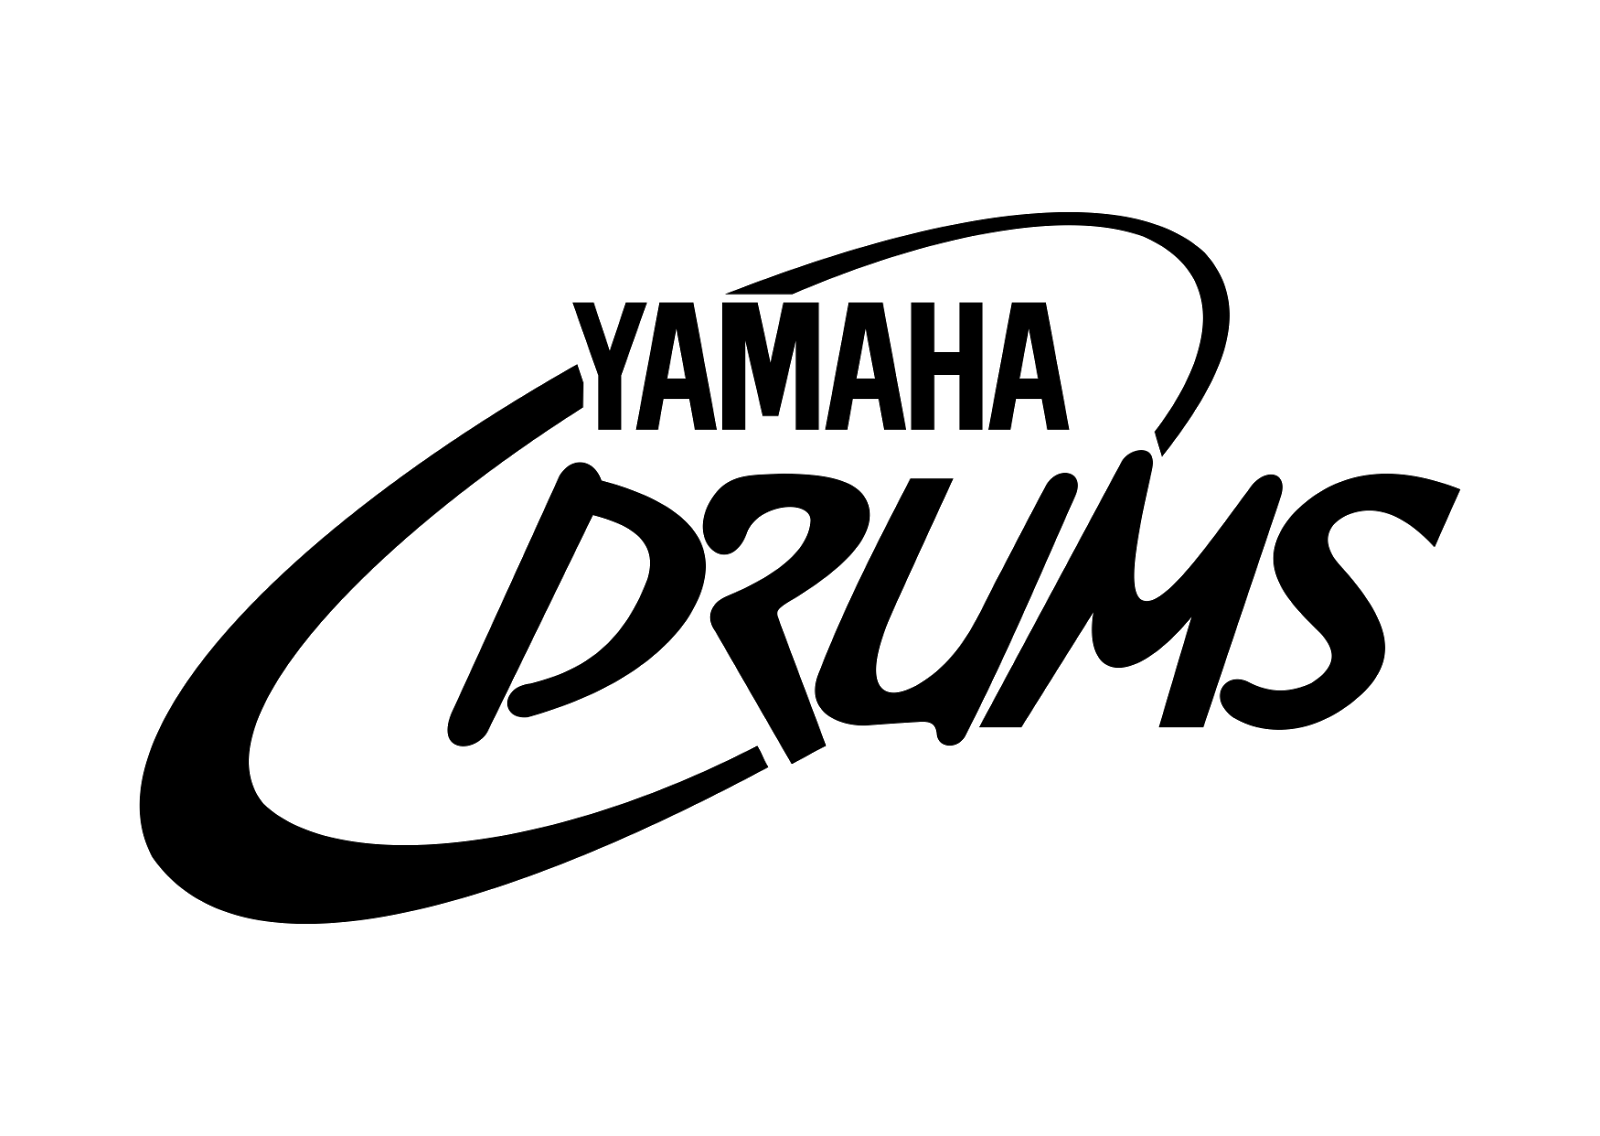 Logo Yamaha Vector - impremedia.net